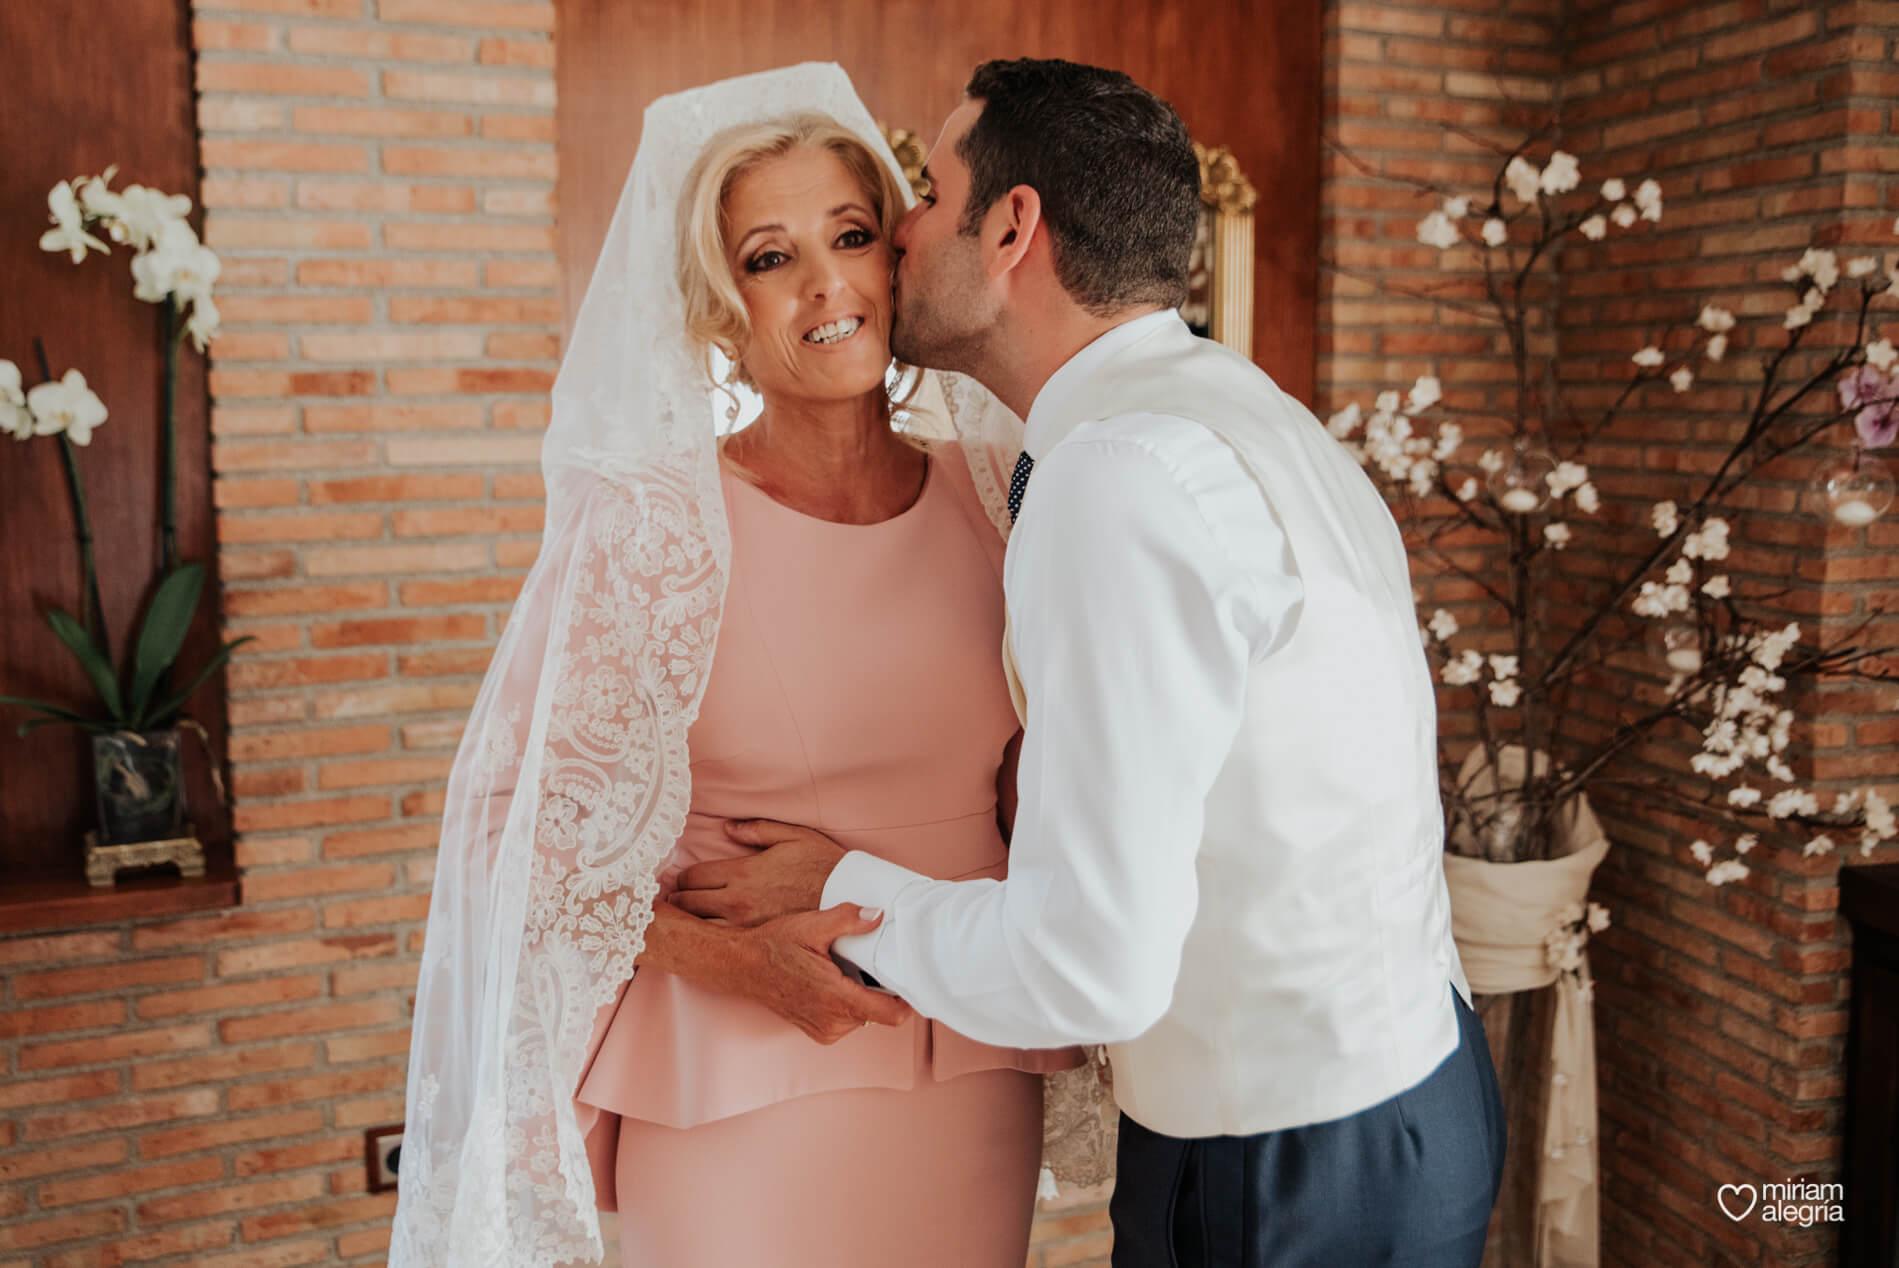 boda-en-almeria-miriam-alegria-25